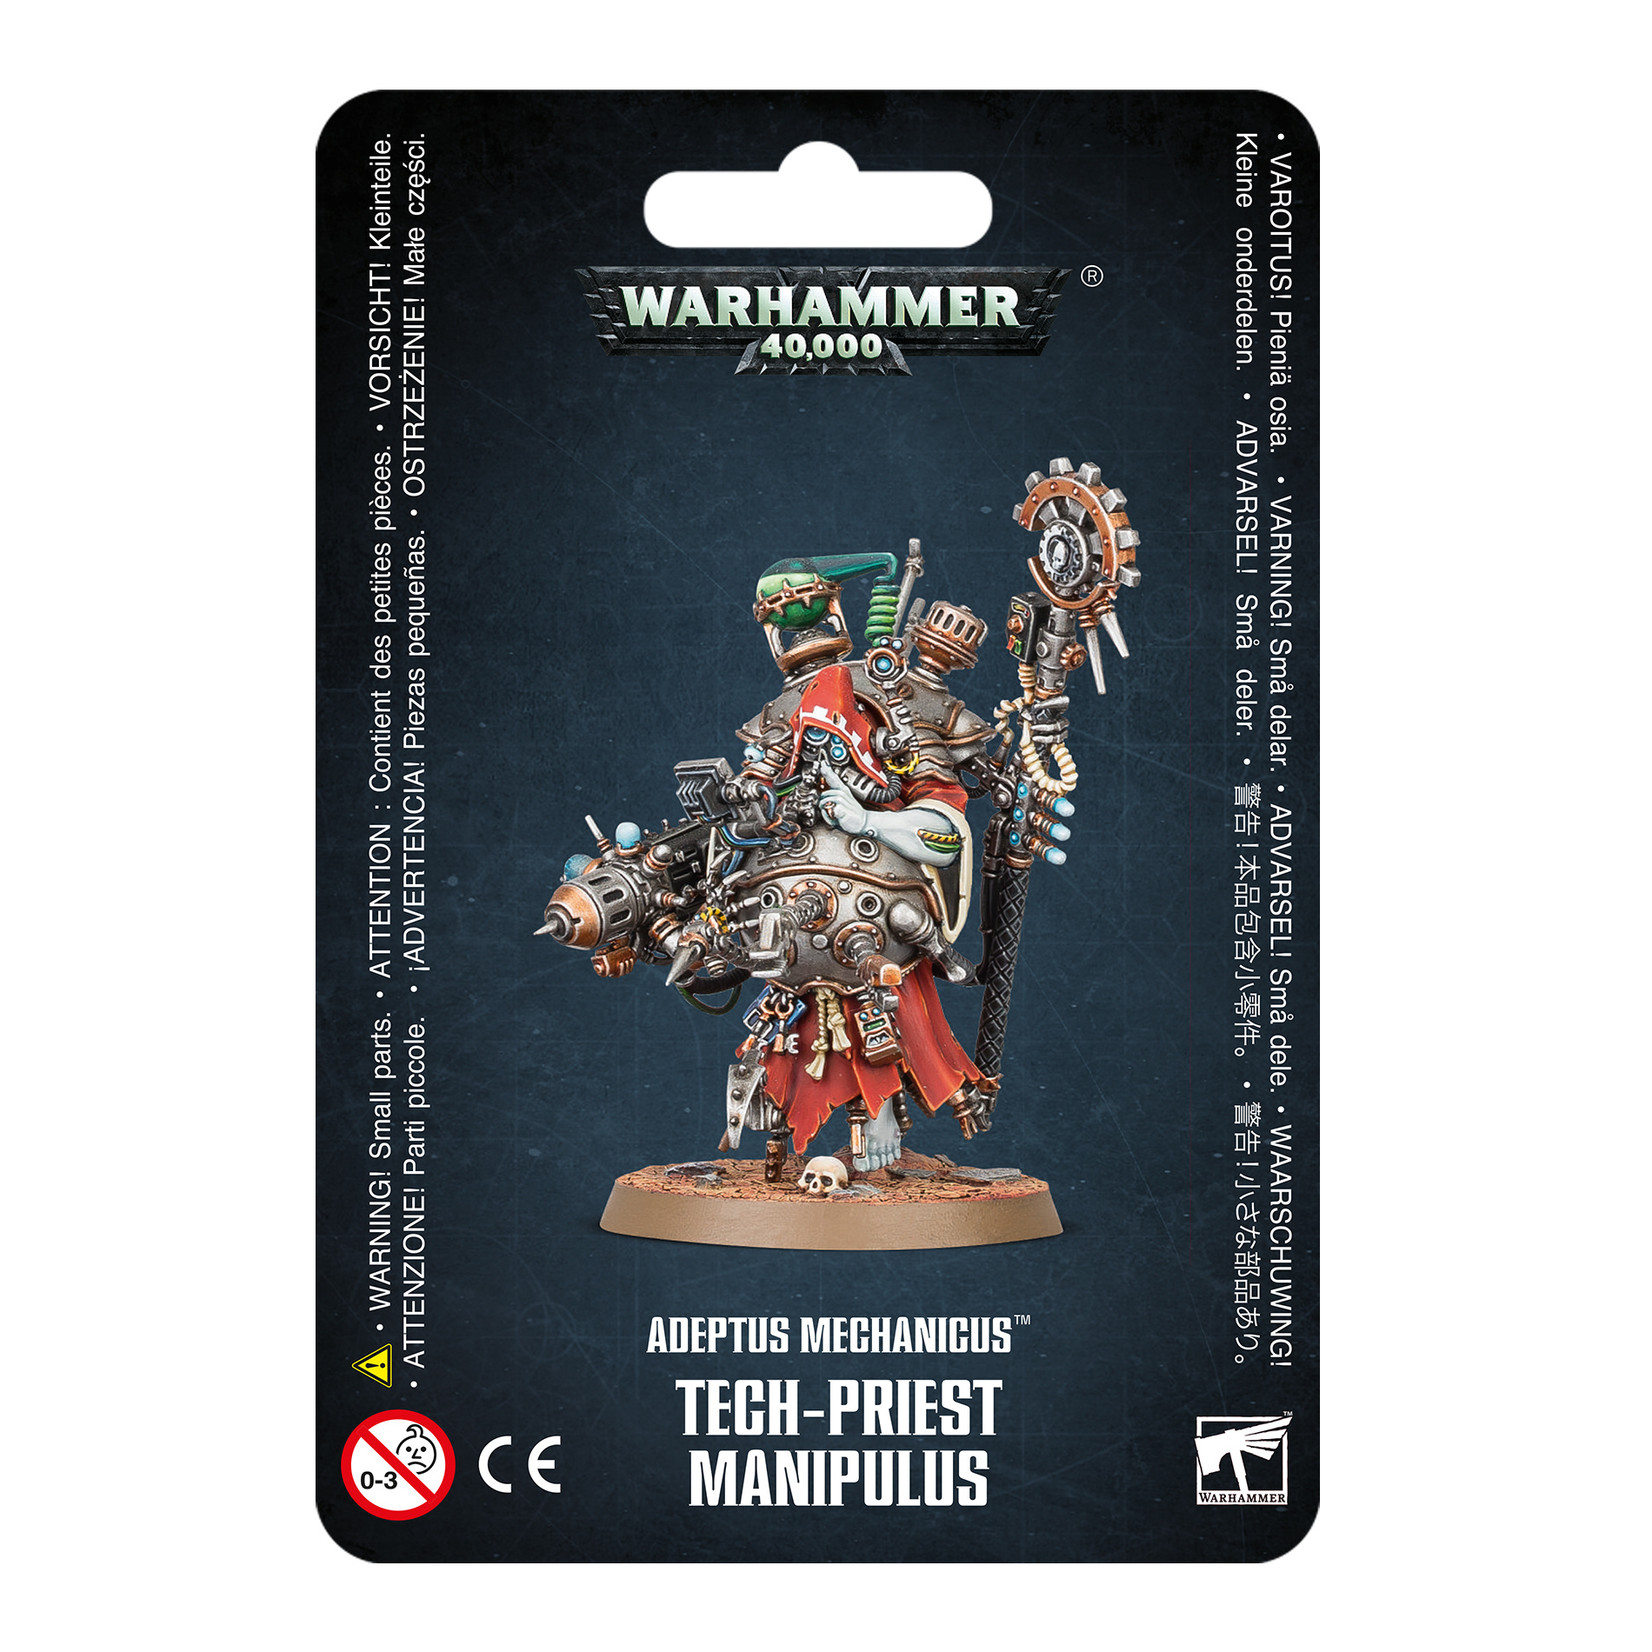 Games Workshop Adeptus Mechanicus Tech-Priest Manipulus